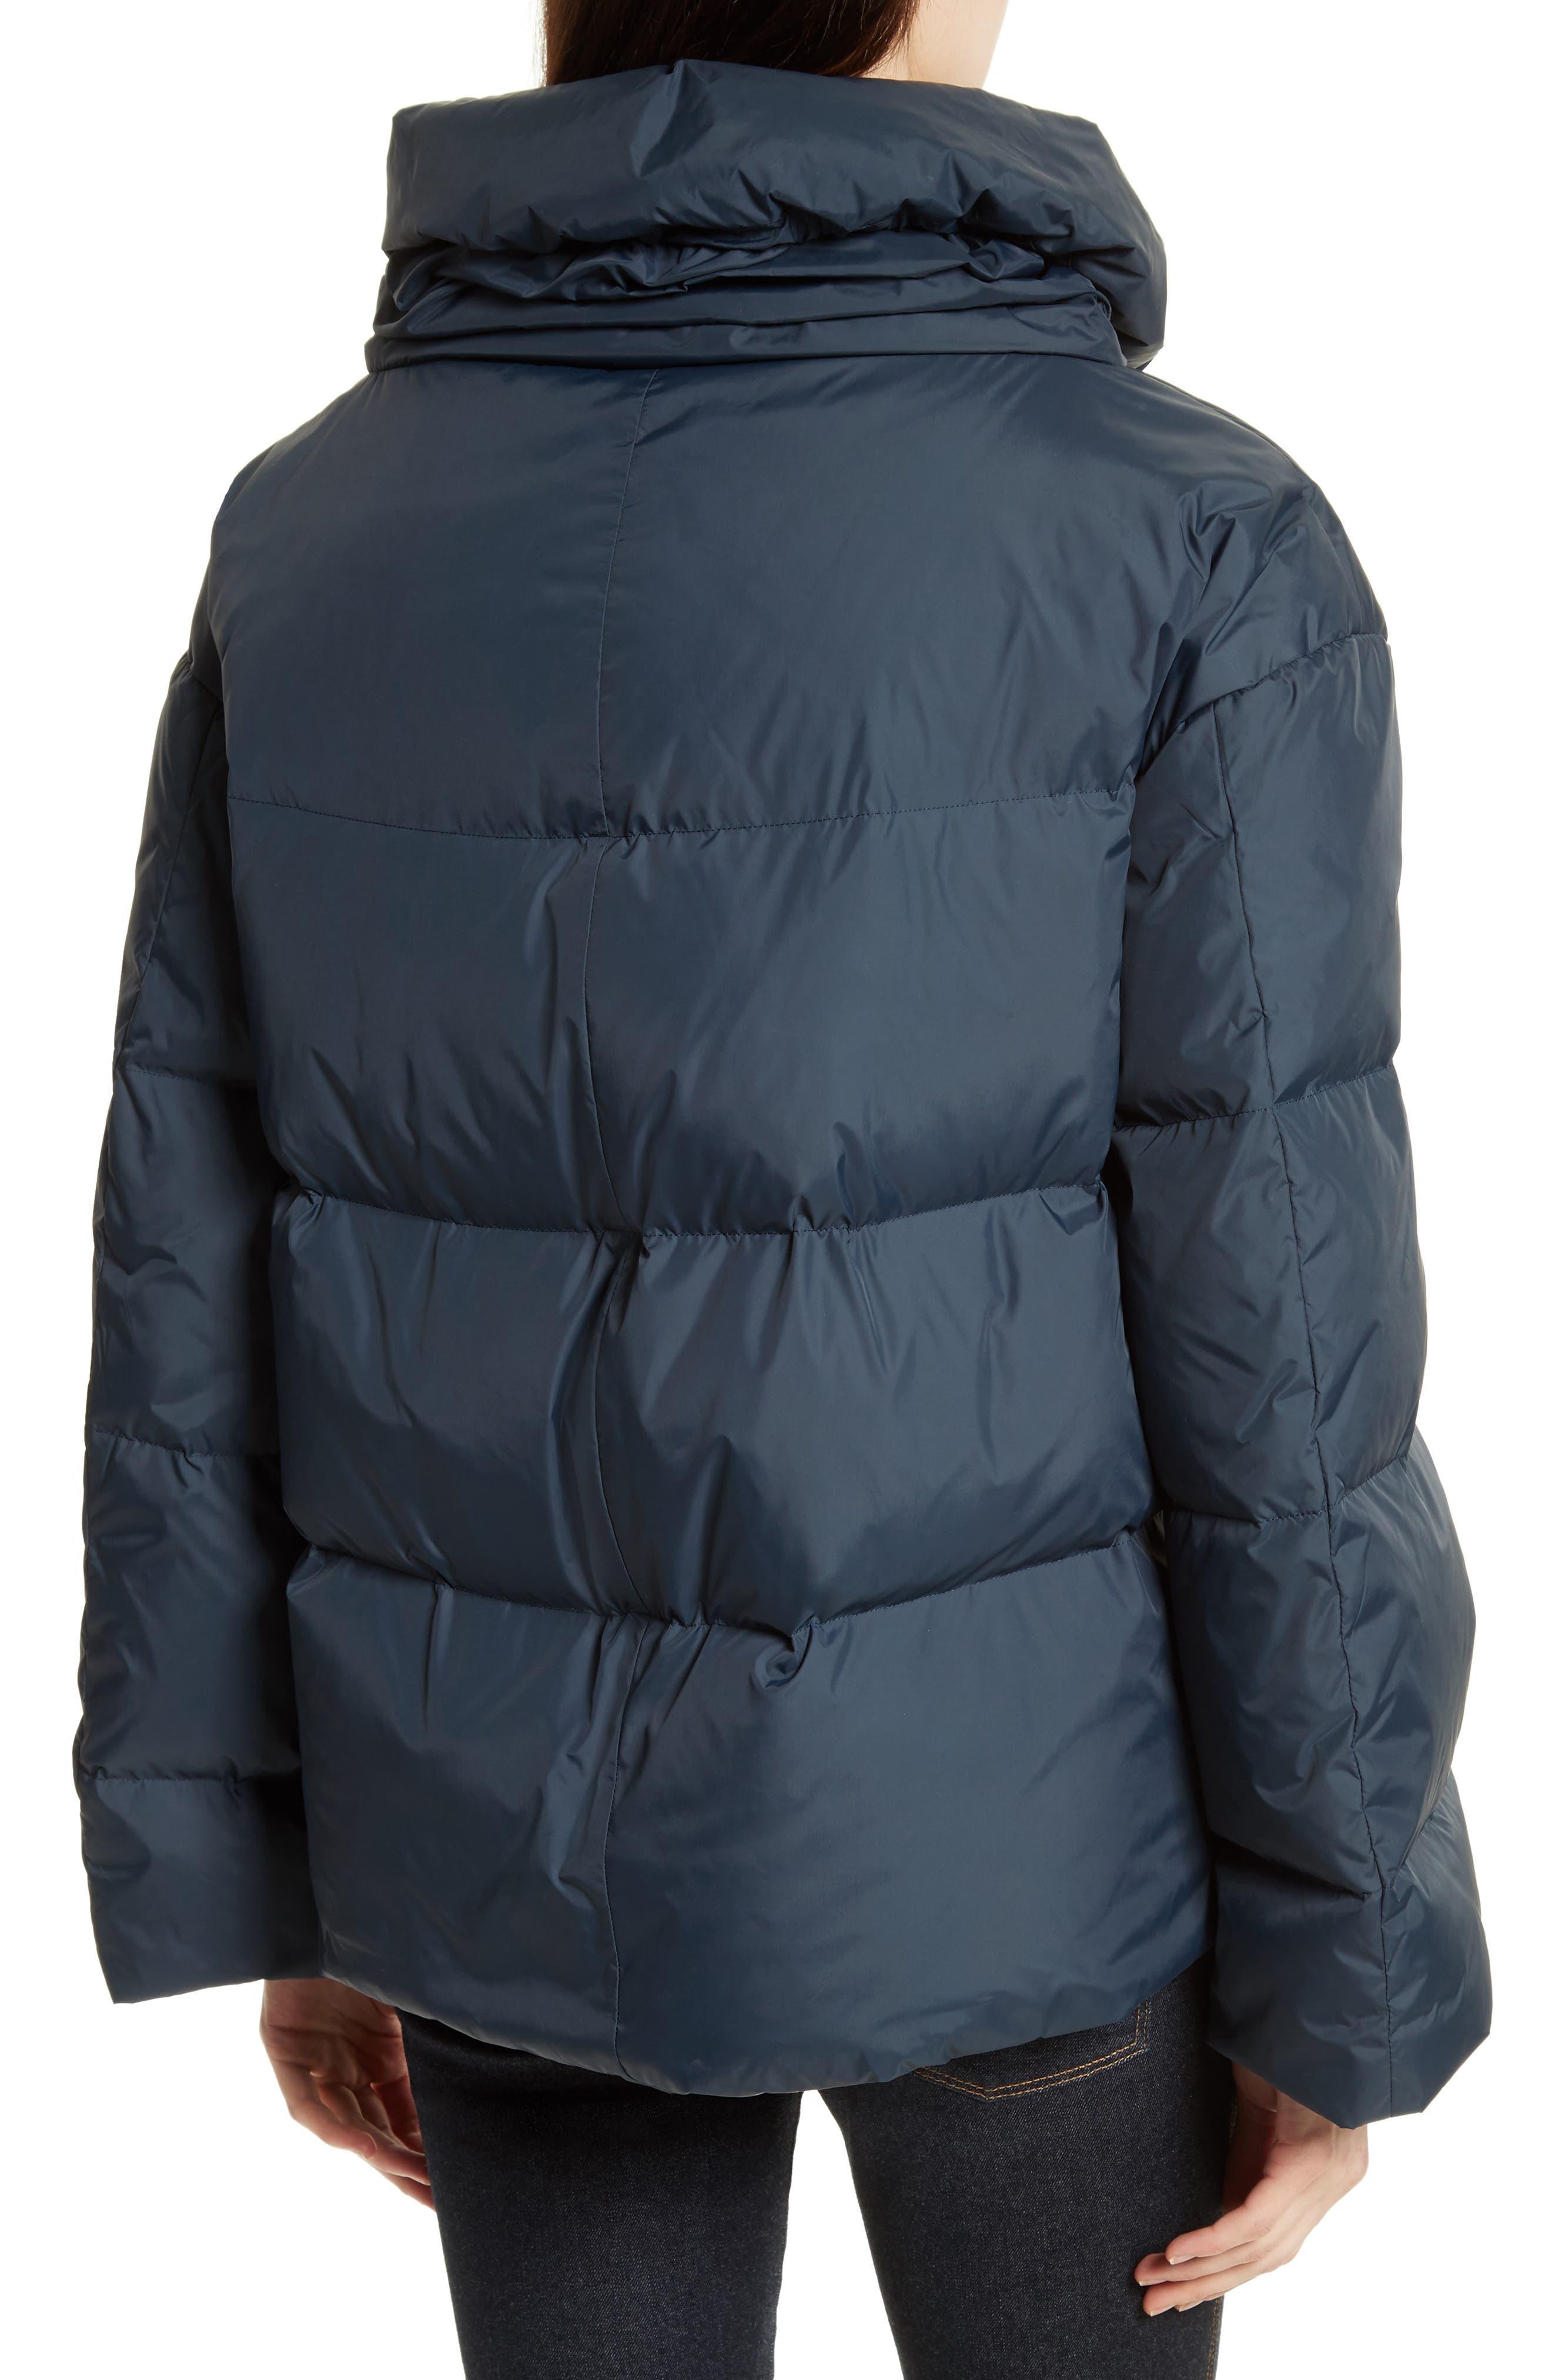 Toralla Puffer Jacket,                             Alternate thumbnail 2, color,                             411